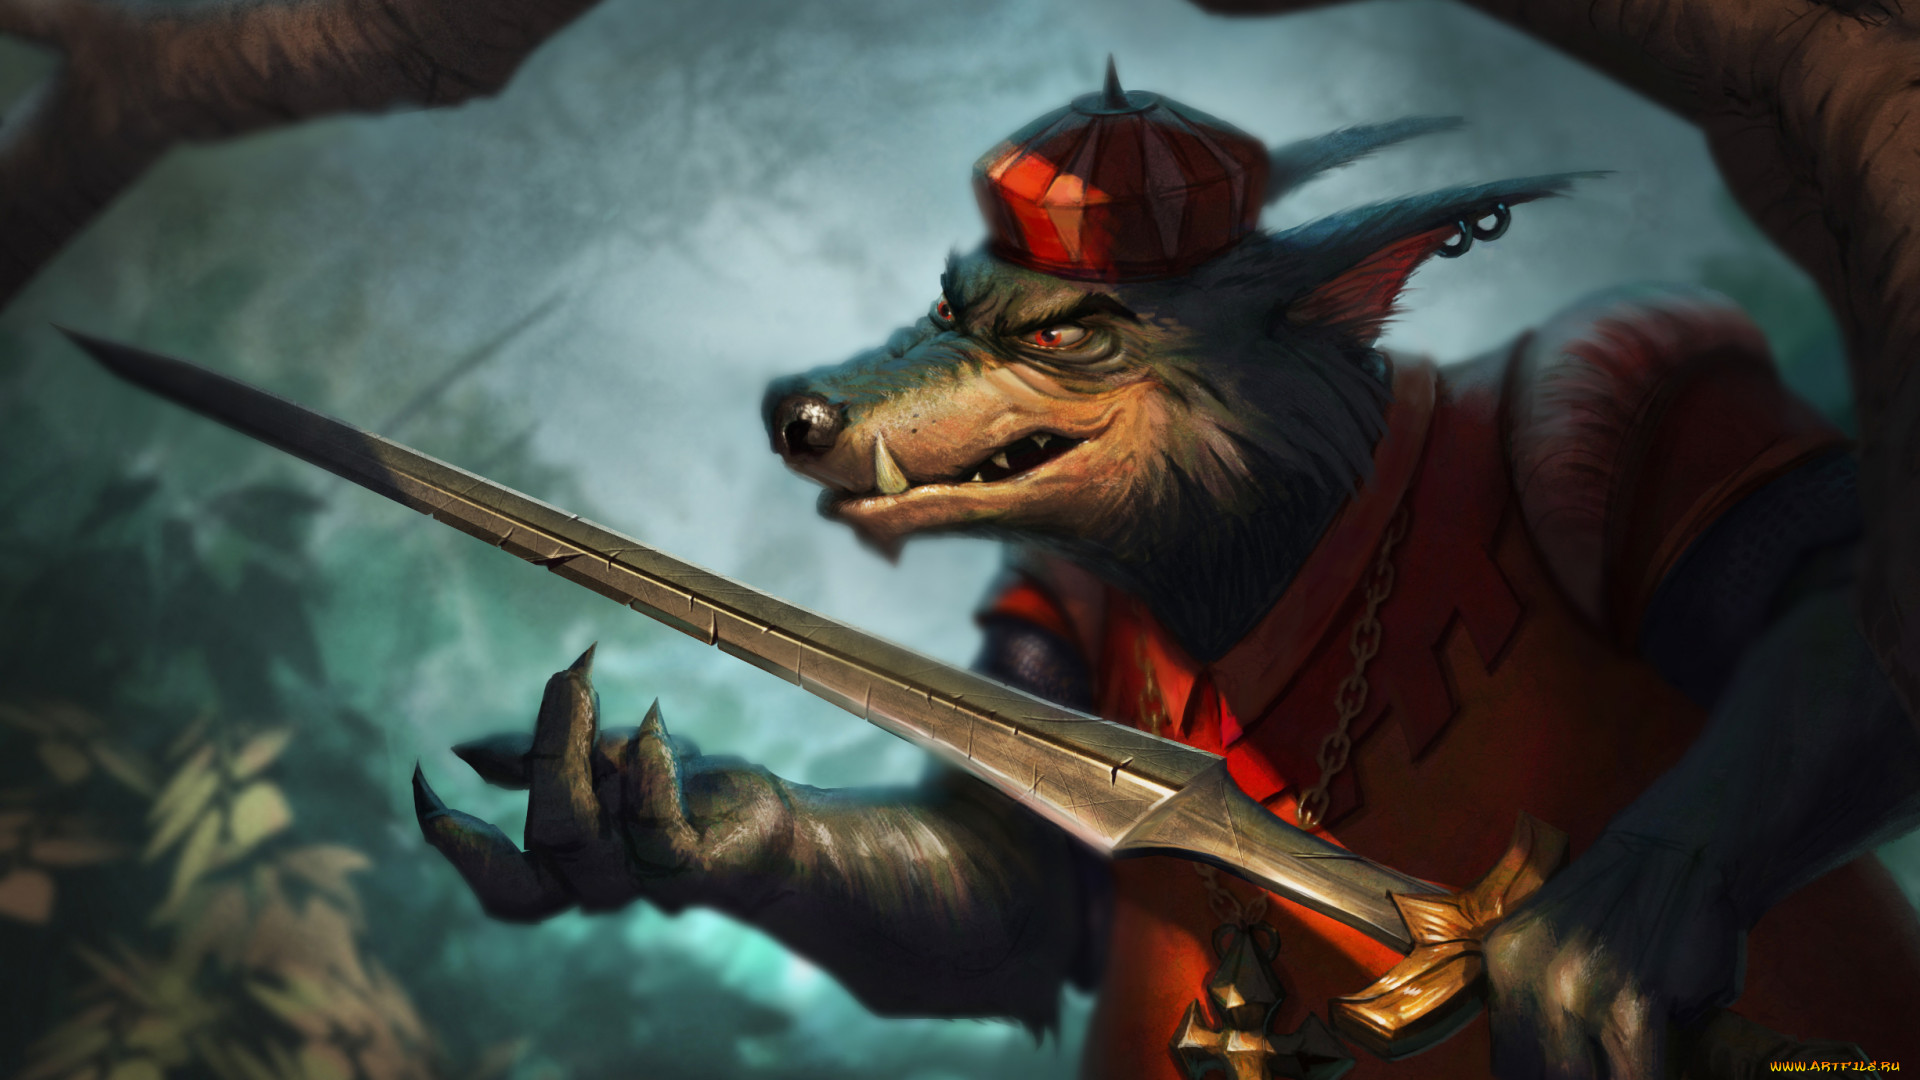 Fantasy Art Sword Creature Artwork Wolf Red Eyes Hat Claws Robin Hood 1920x1080